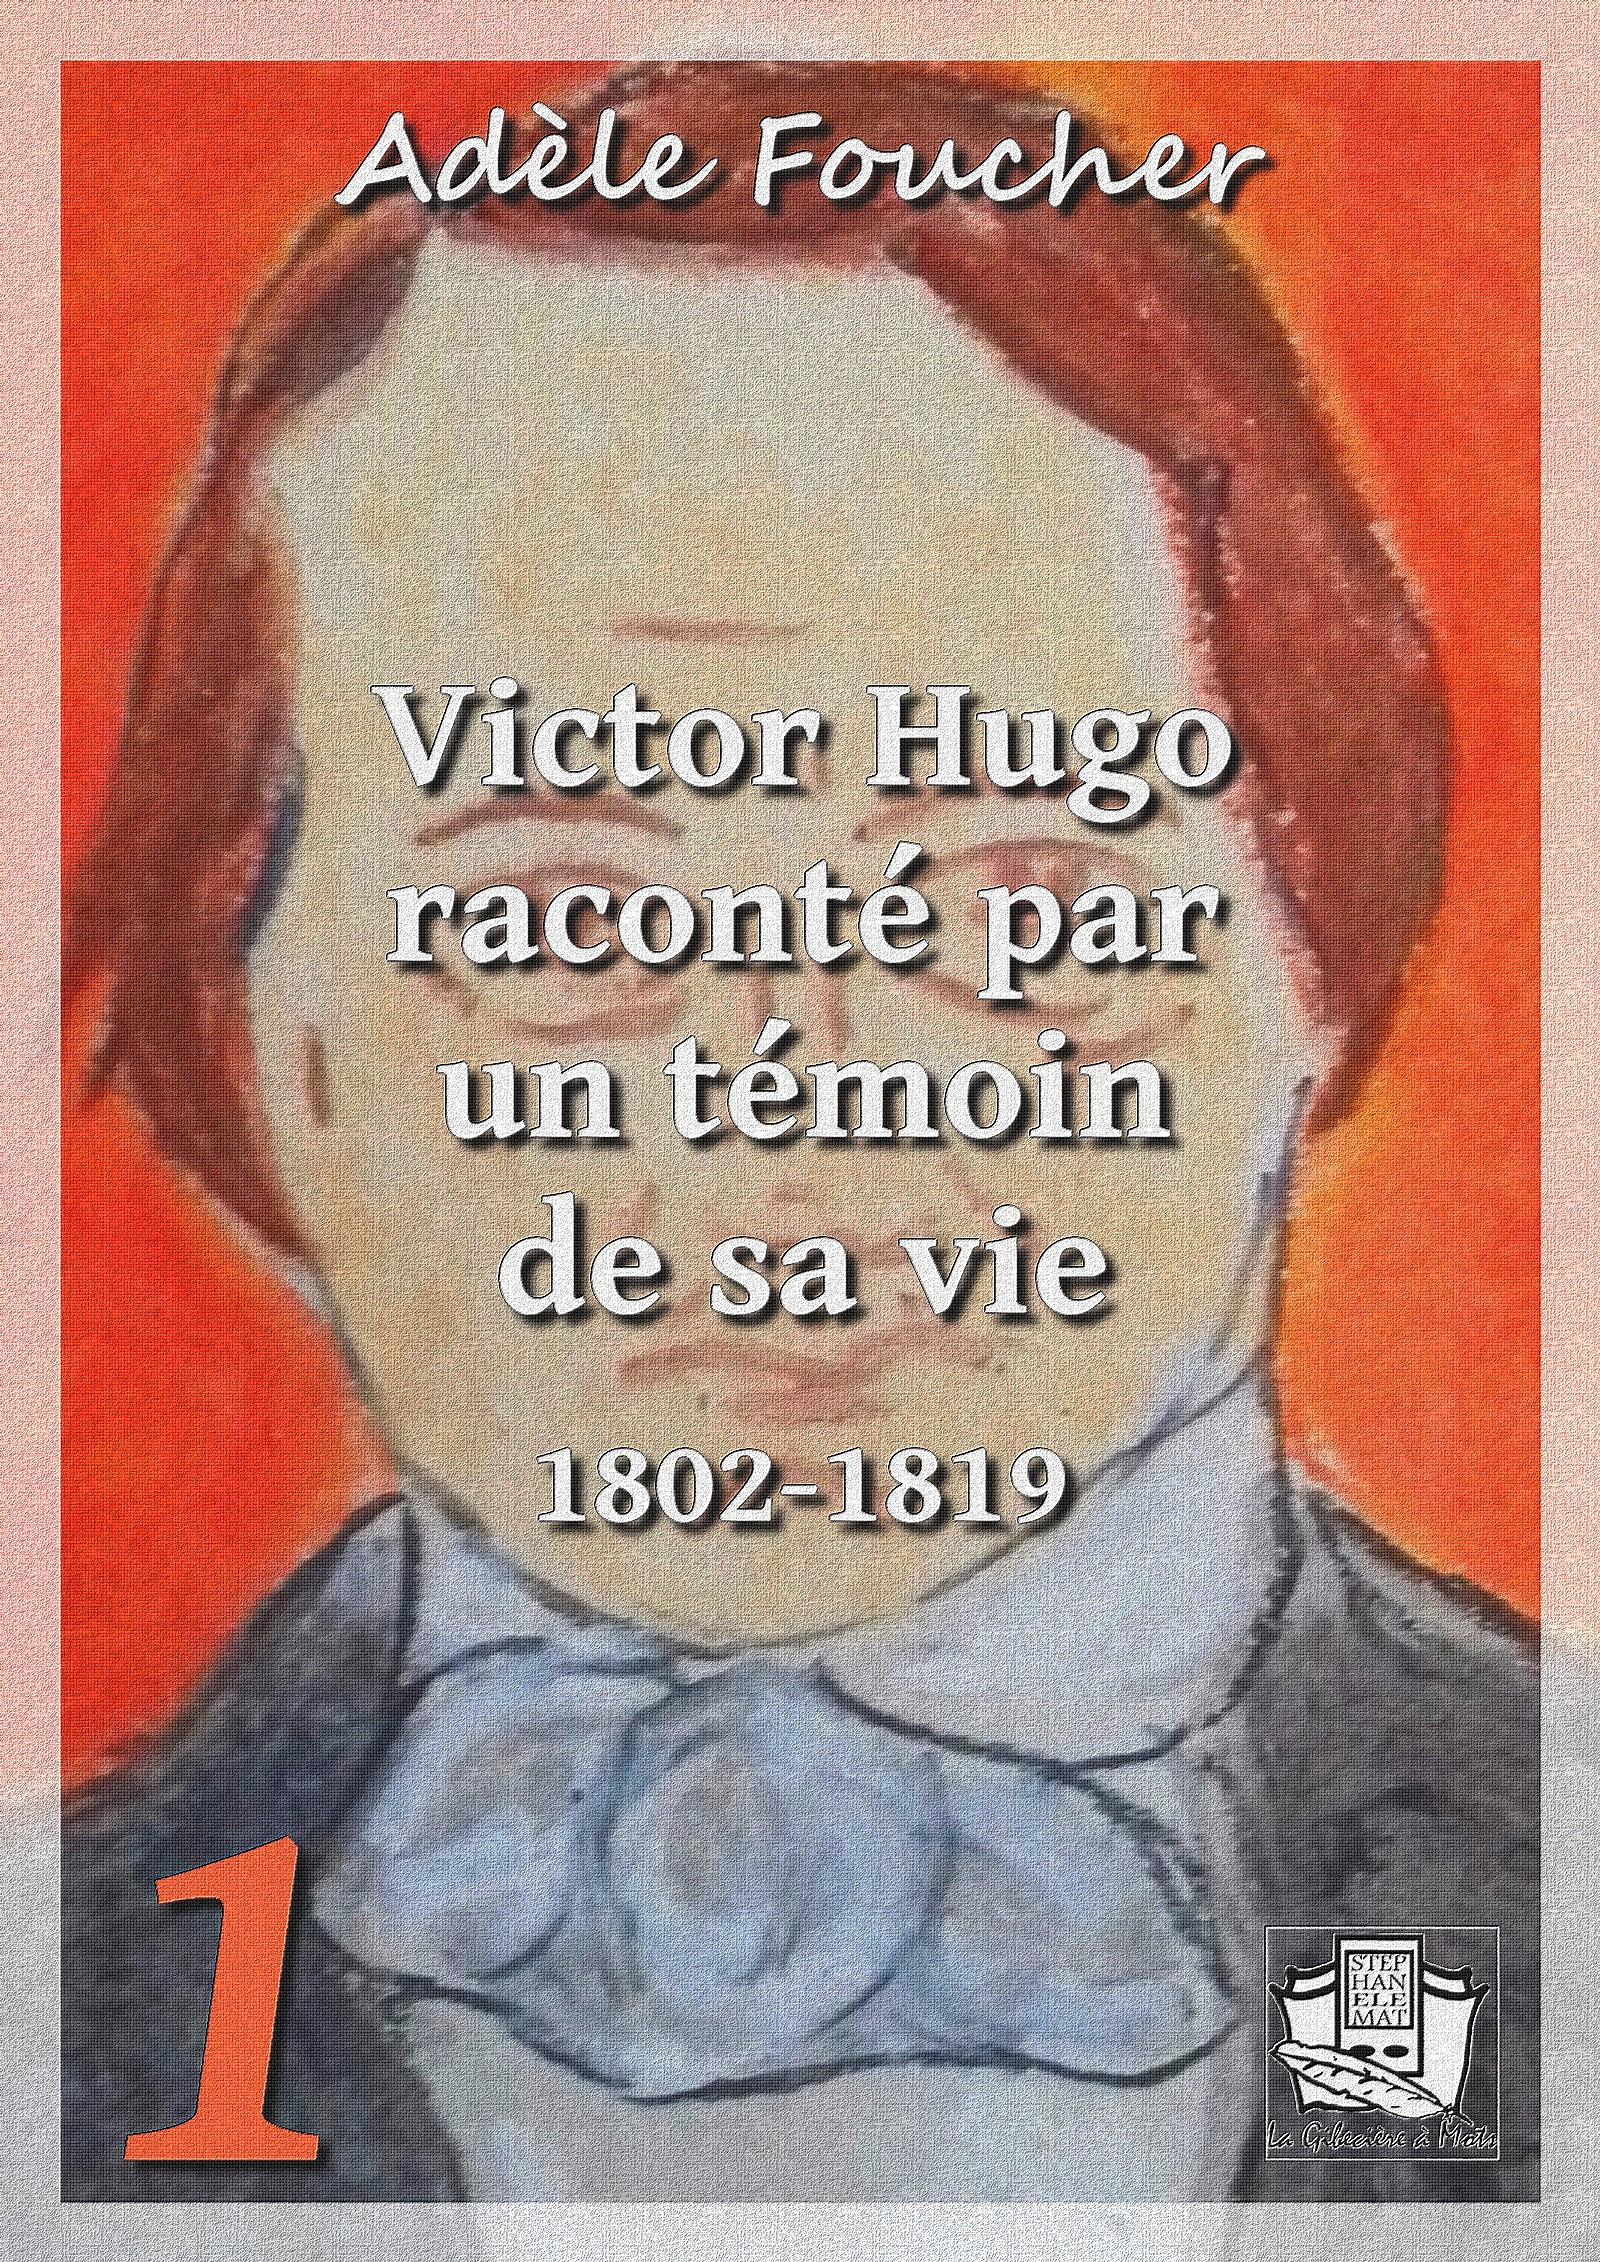 Victor Hugo raconté par un témoin de sa vie, TOME I